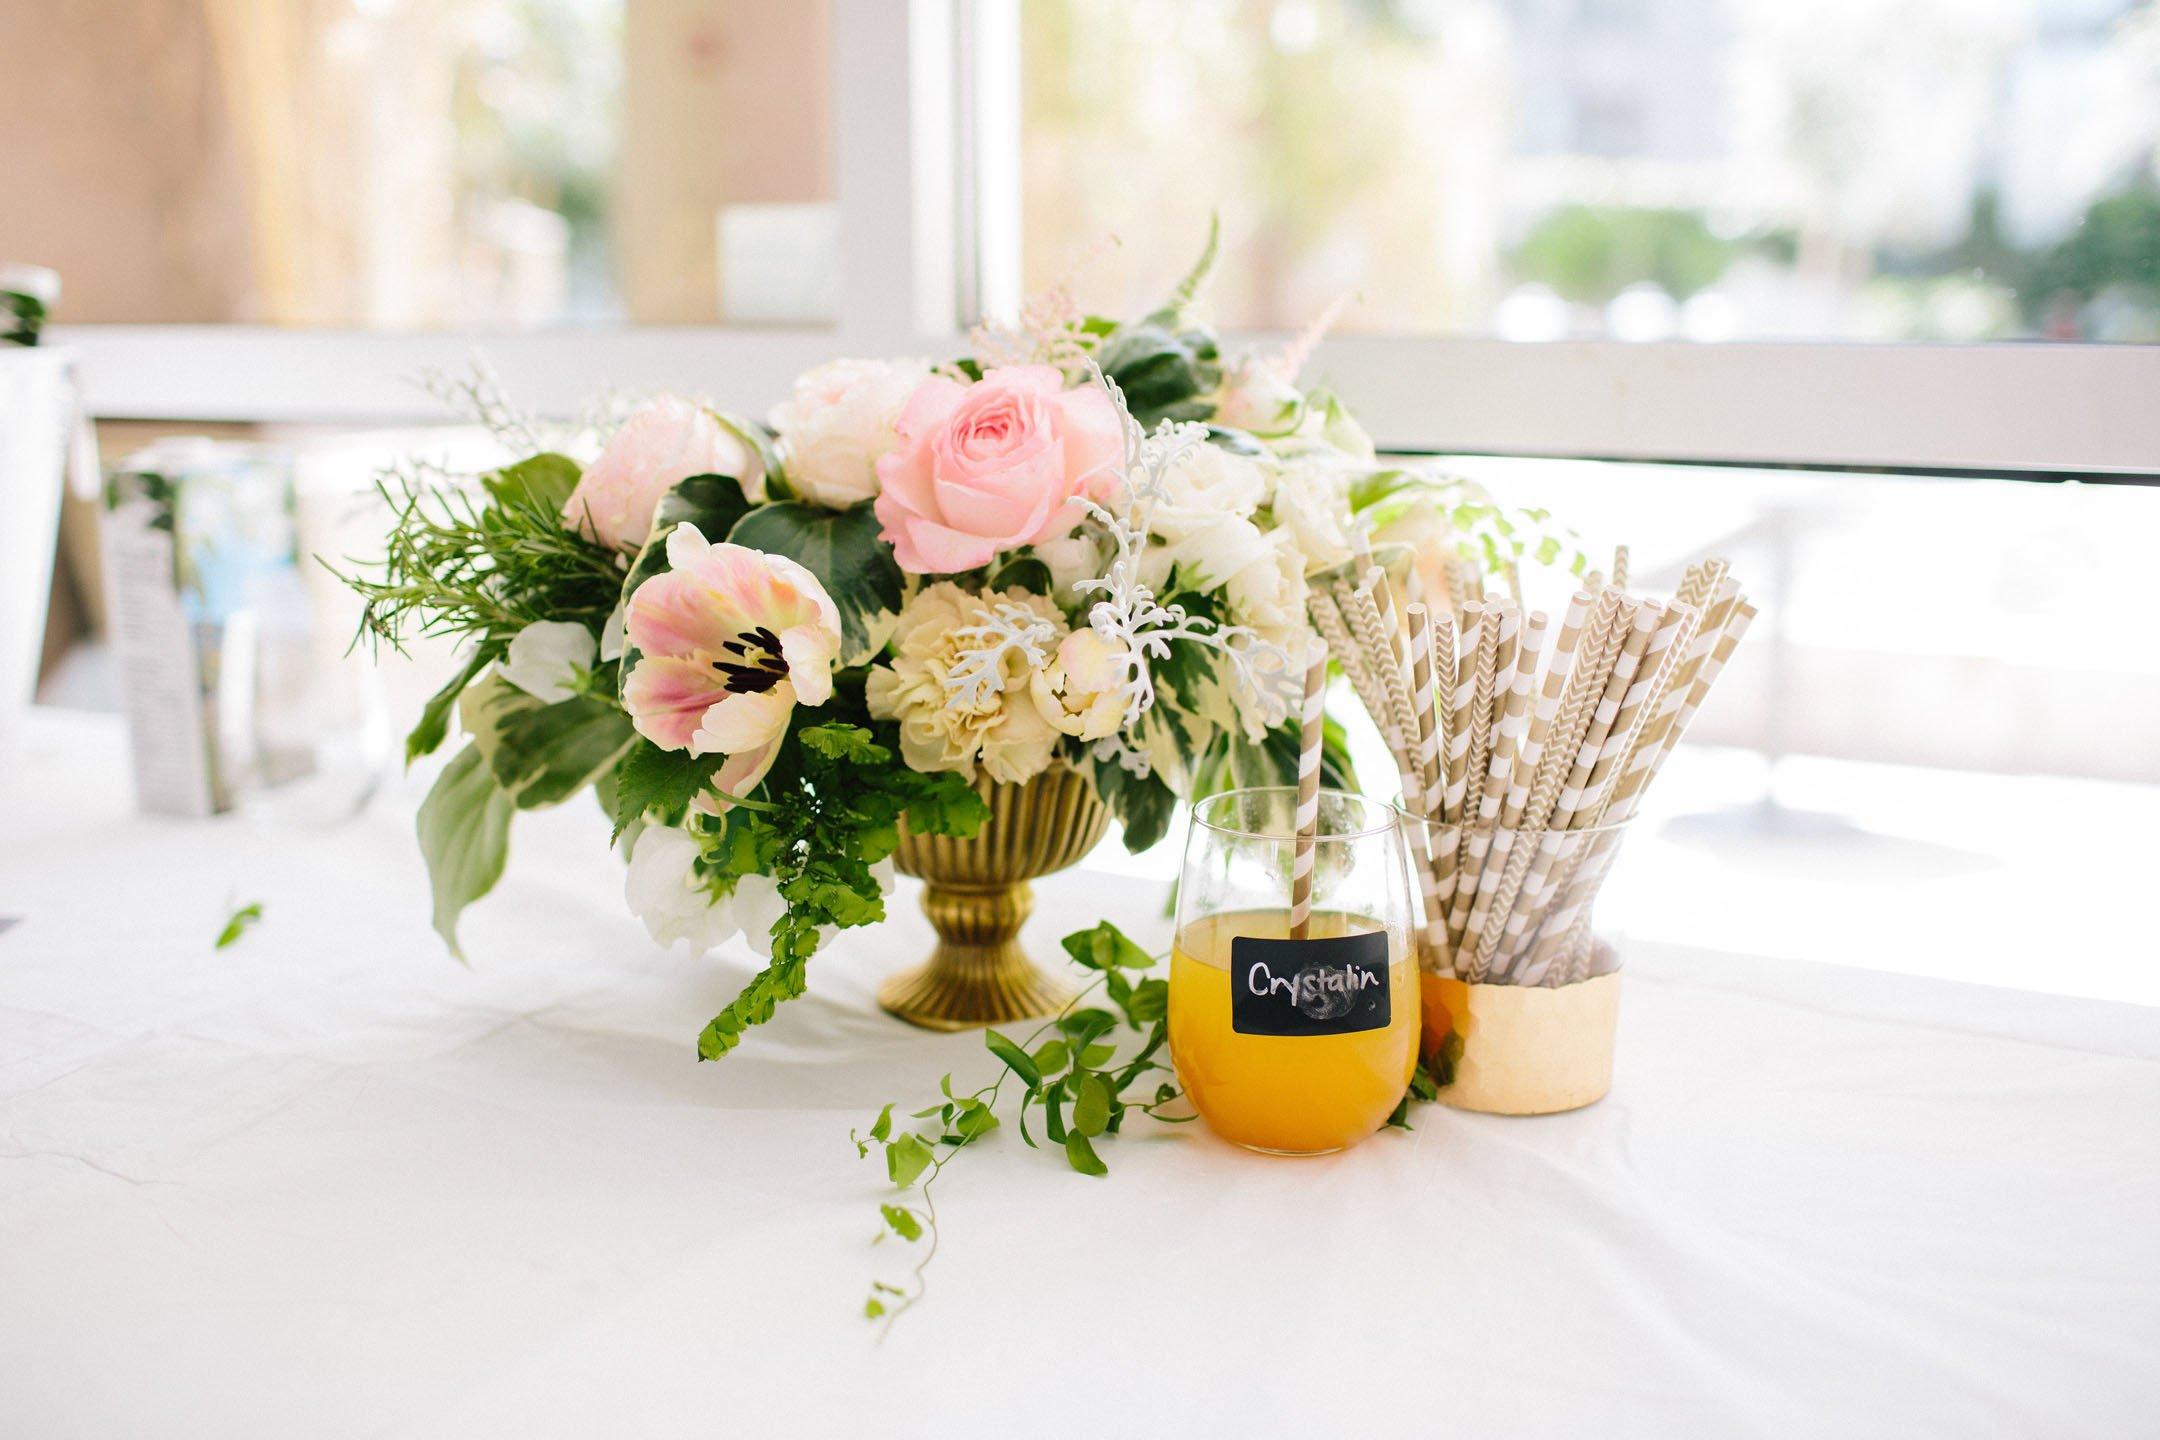 Tango & Foxtrot florals